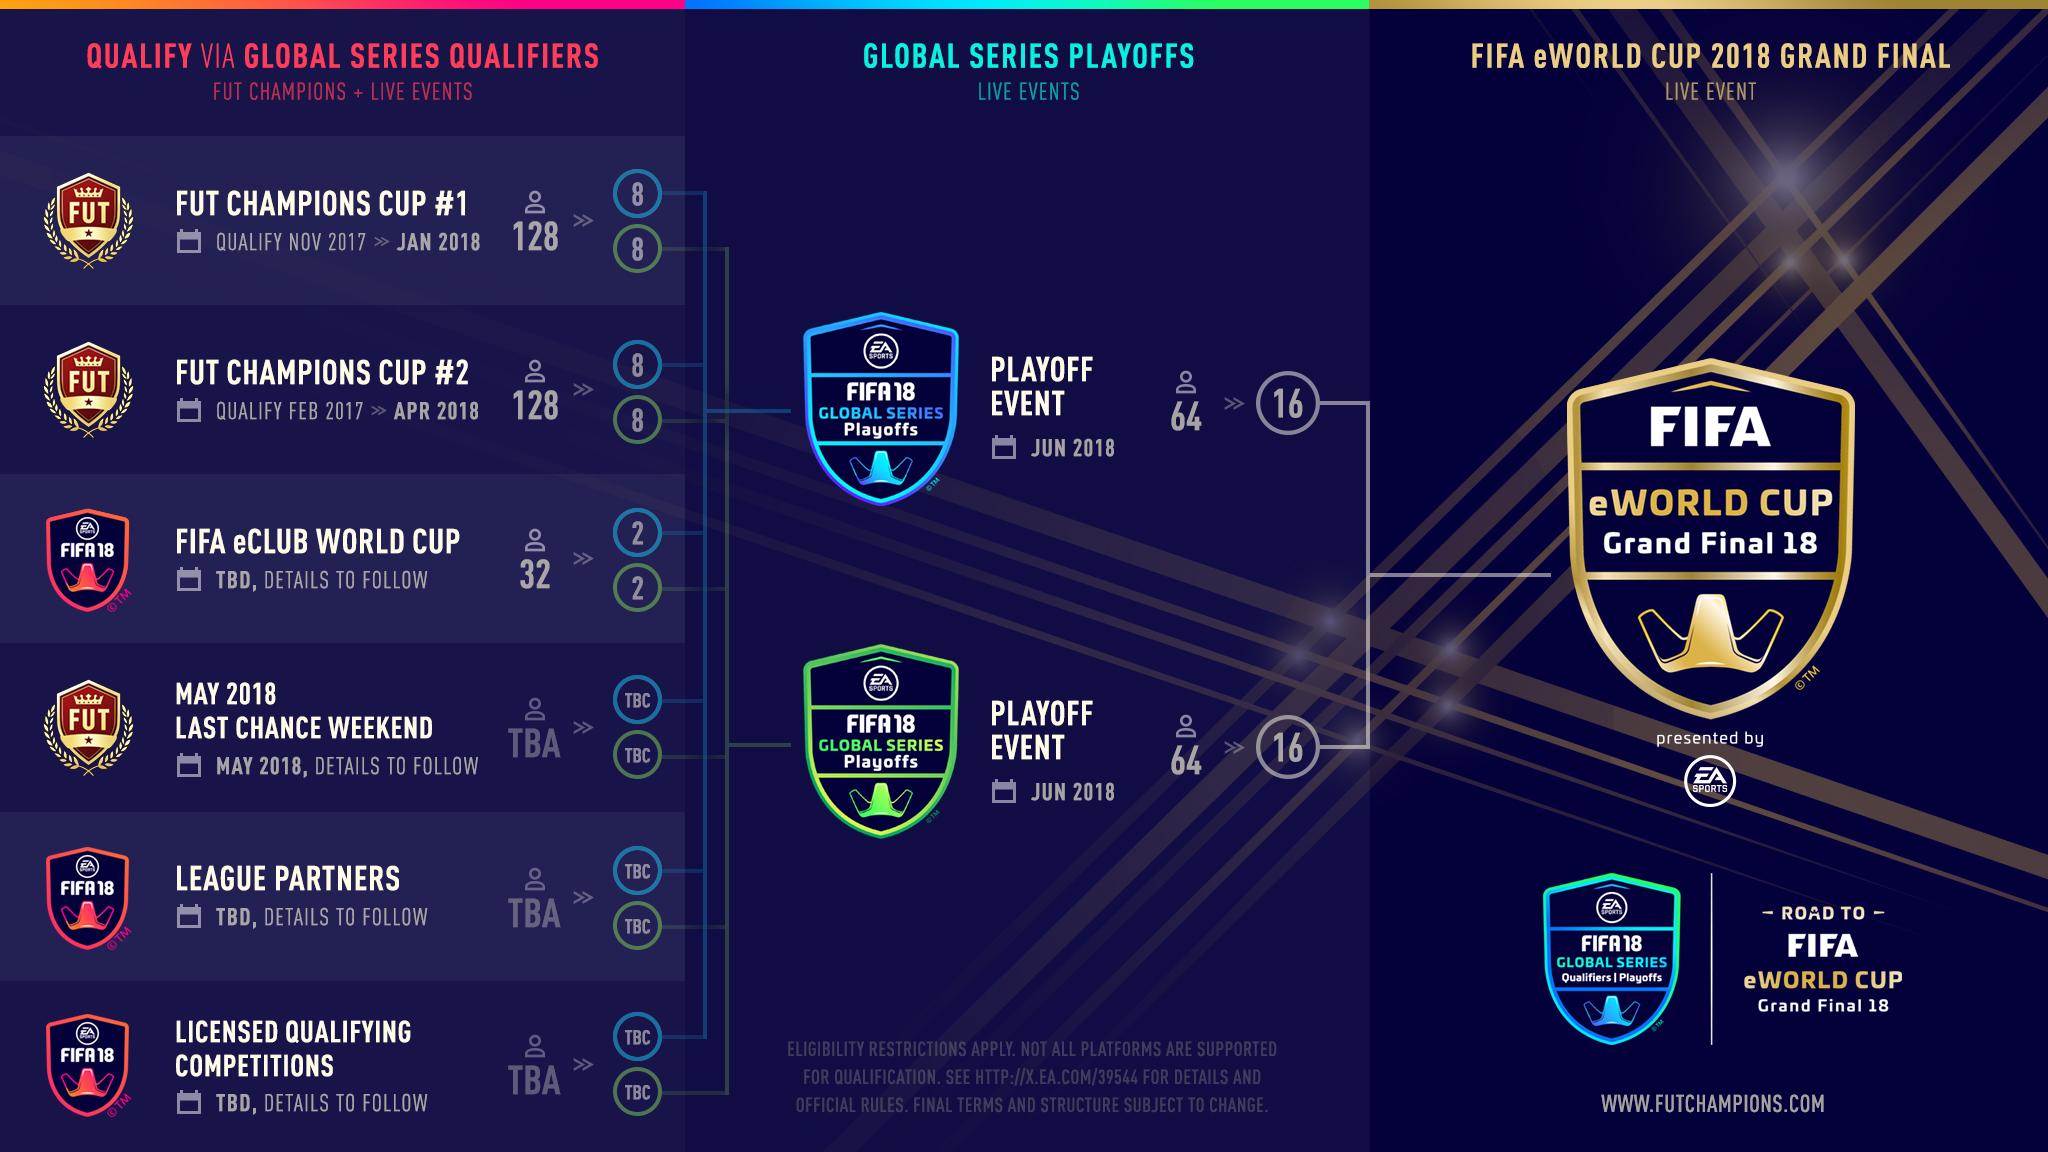 fifa eworld cup final